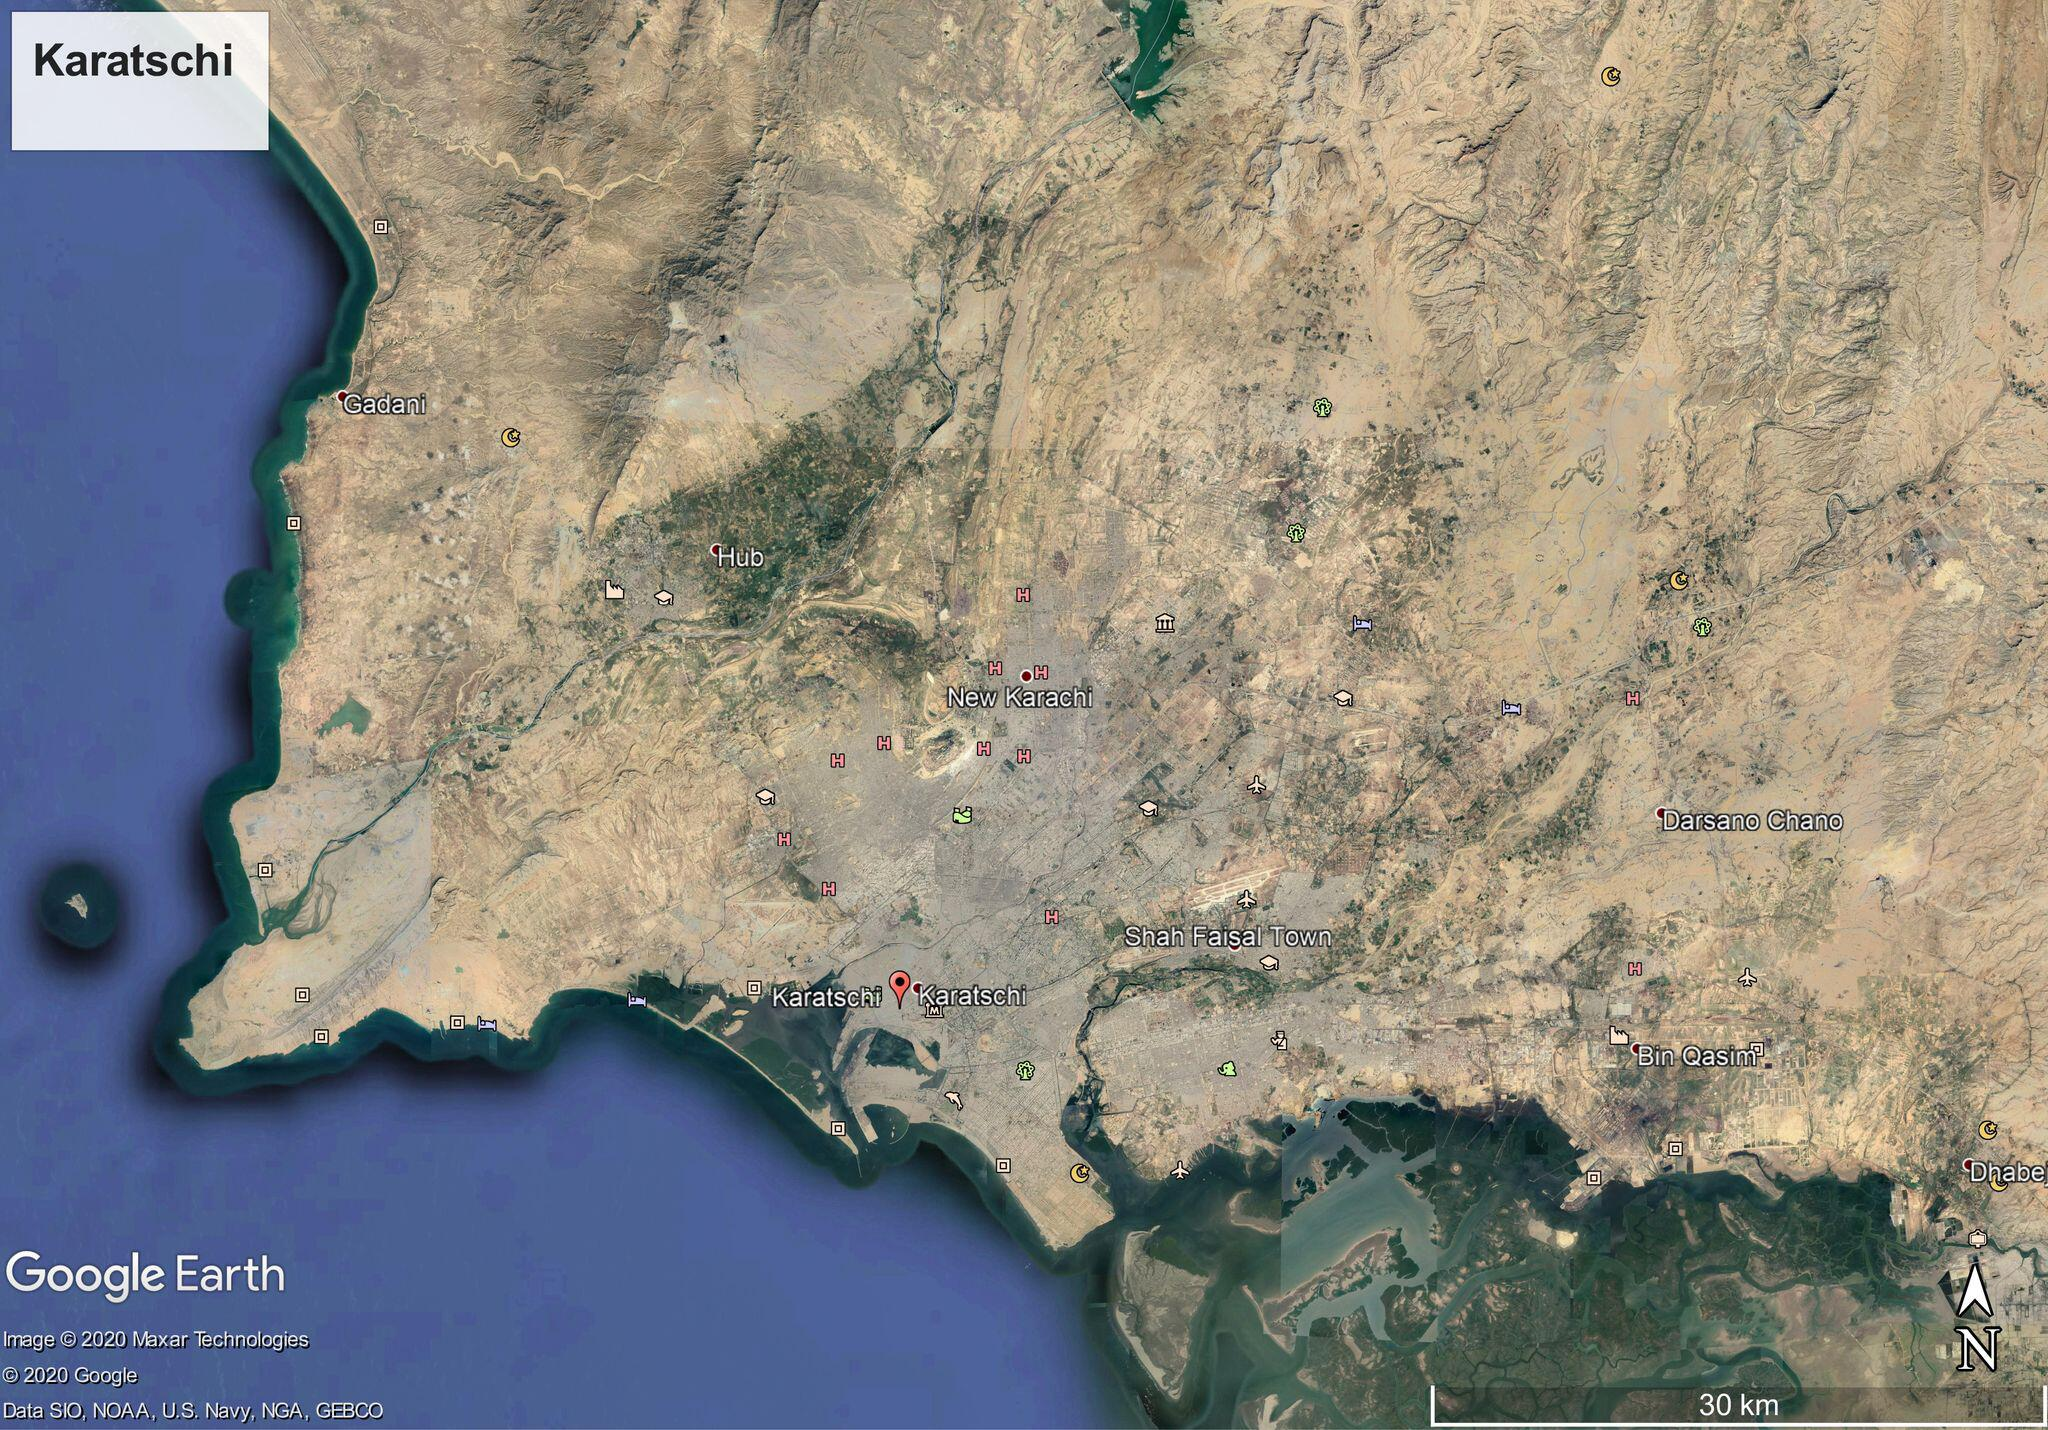 Bild zu Pakistan, Karte, FLugzeugabsturz